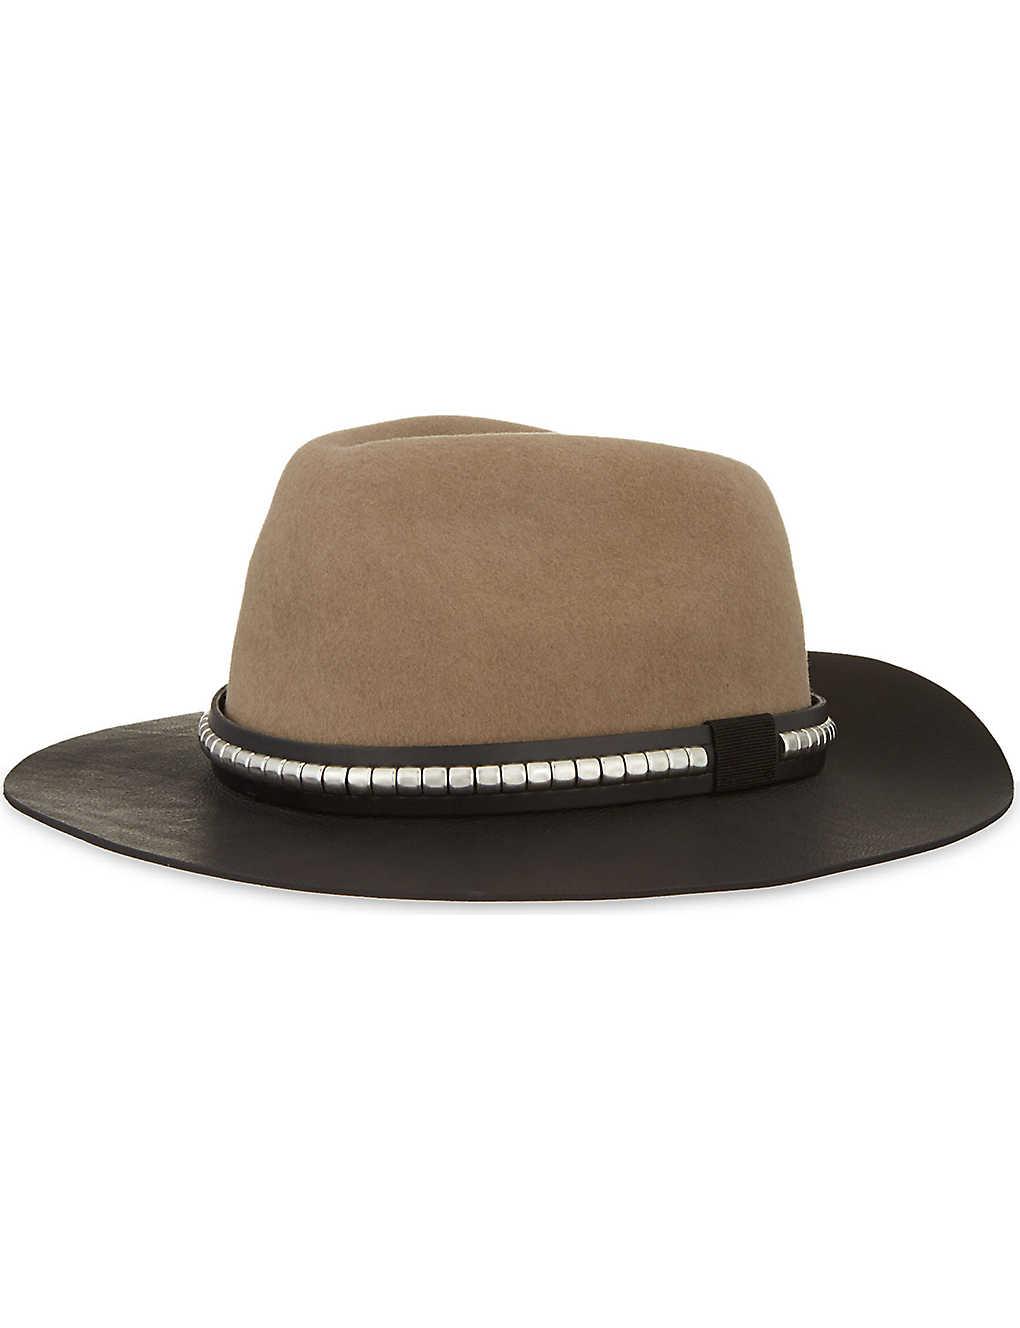 THE KOOPLES - Western leather & felt hat | Selfridges com